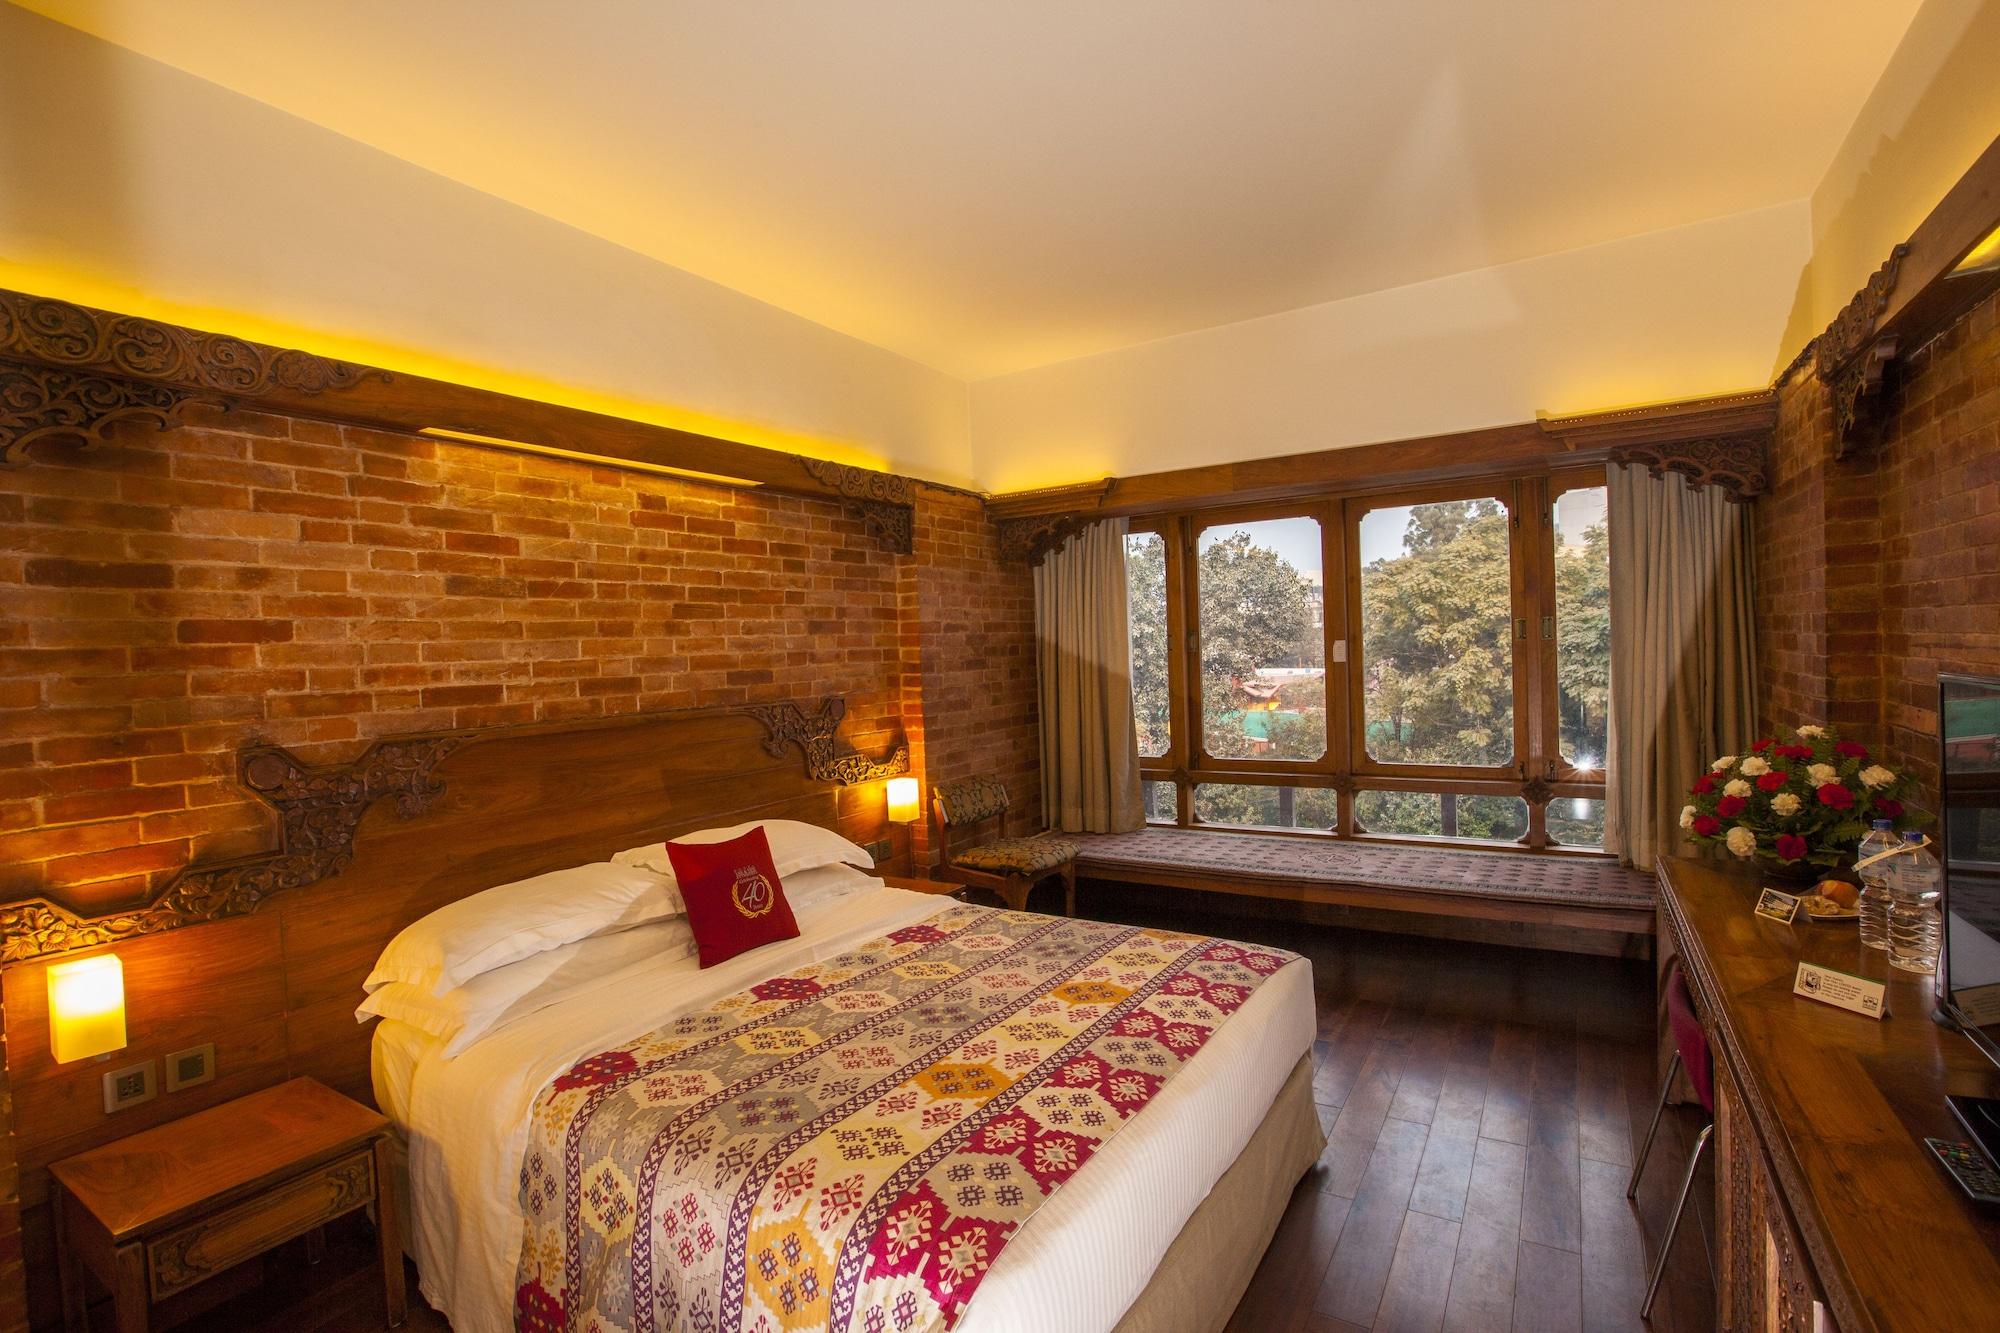 Hotel Yak & Yeti, Bagmati